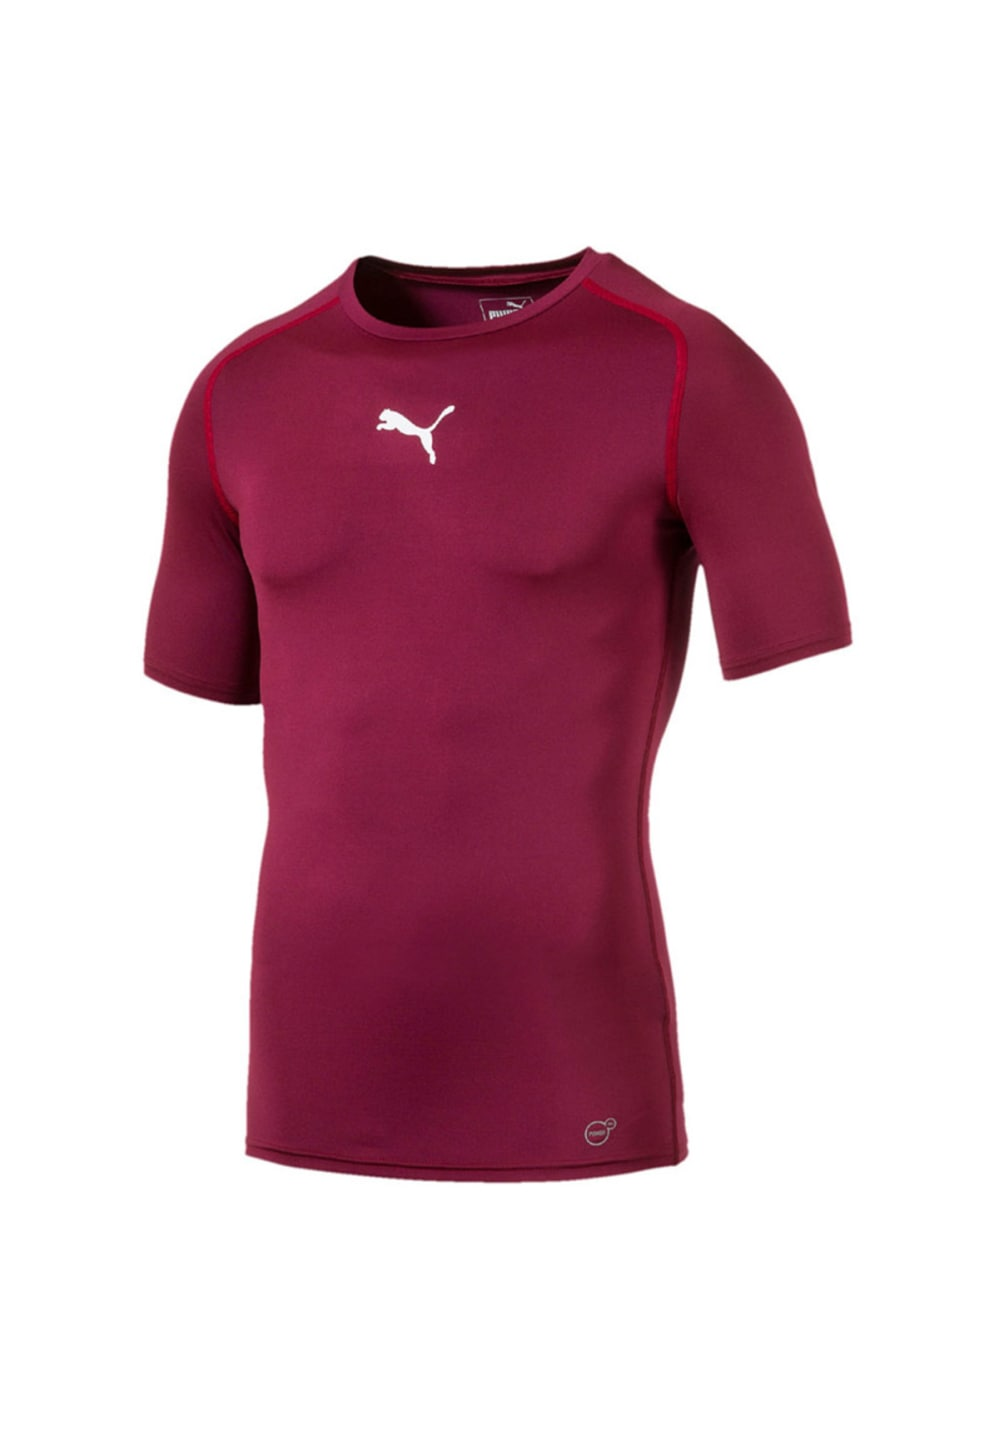 218b2e0465852 Puma Tb Short Sleeve Tee - Fitnessshirts für Herren - Rot